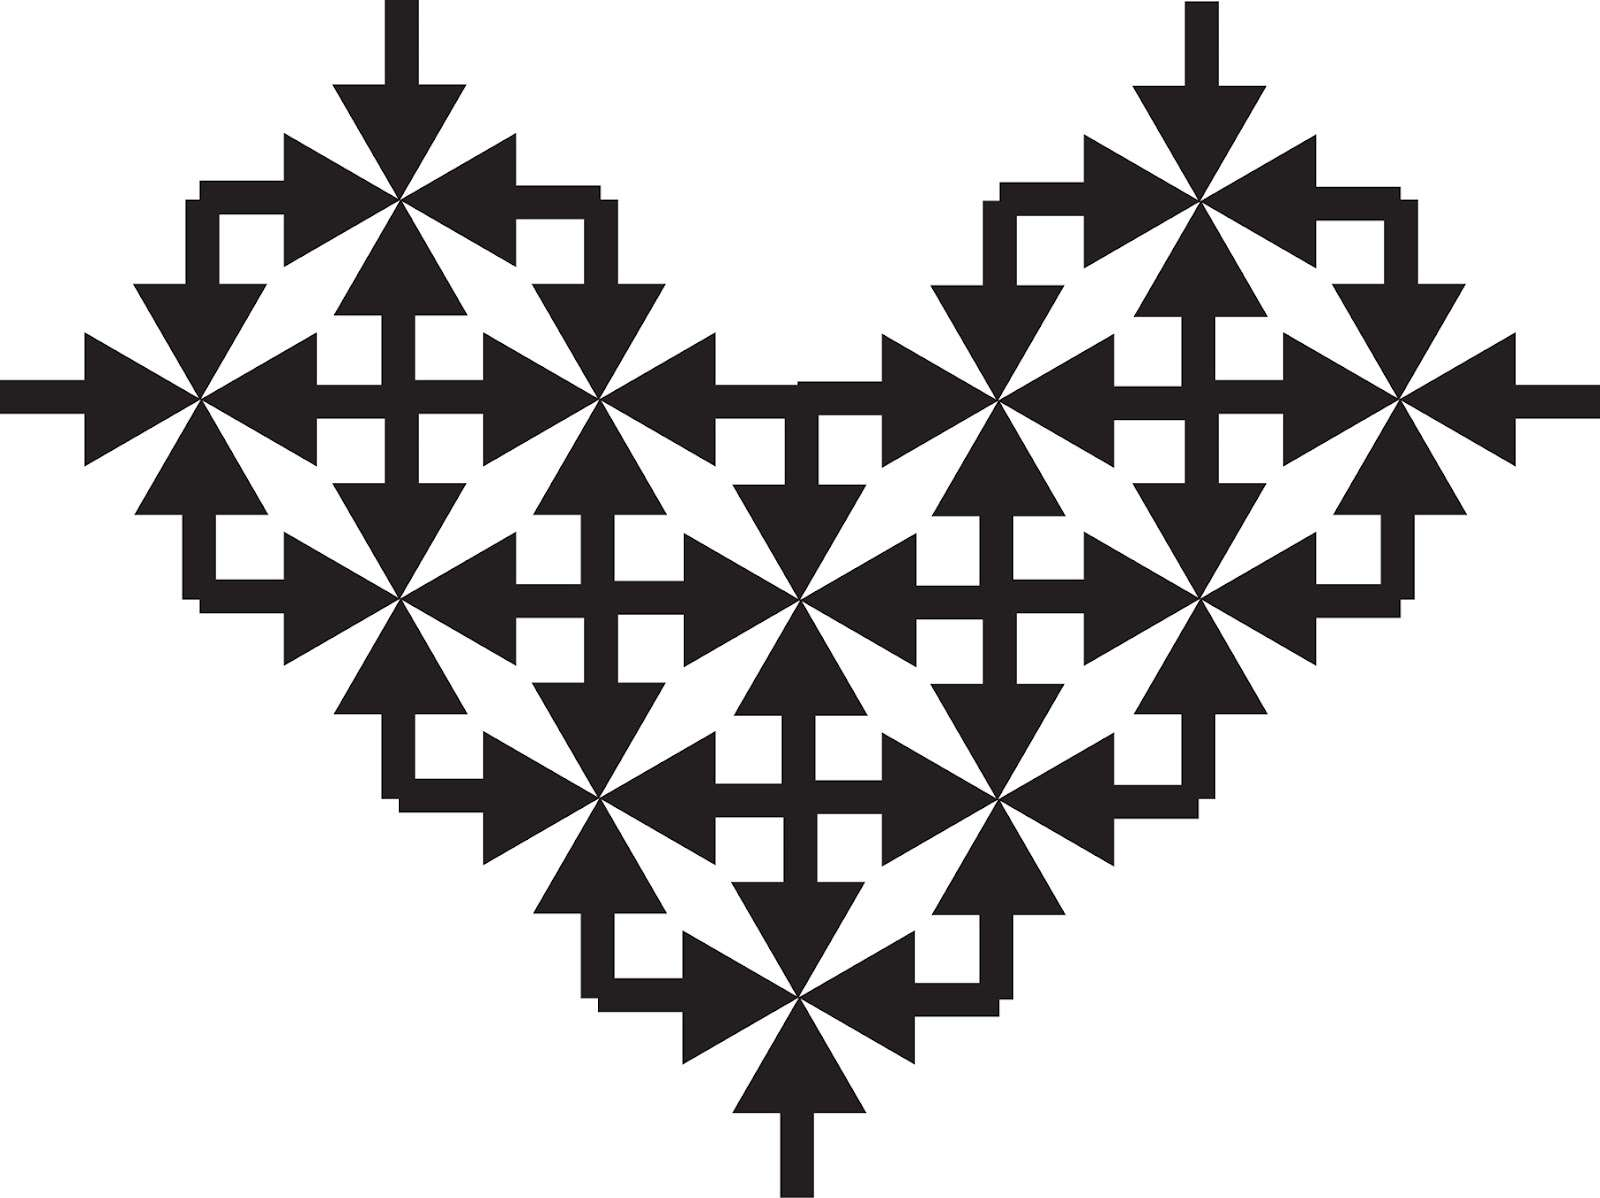 Alisa Rena Sriwattana Symmetrical Designs Letters